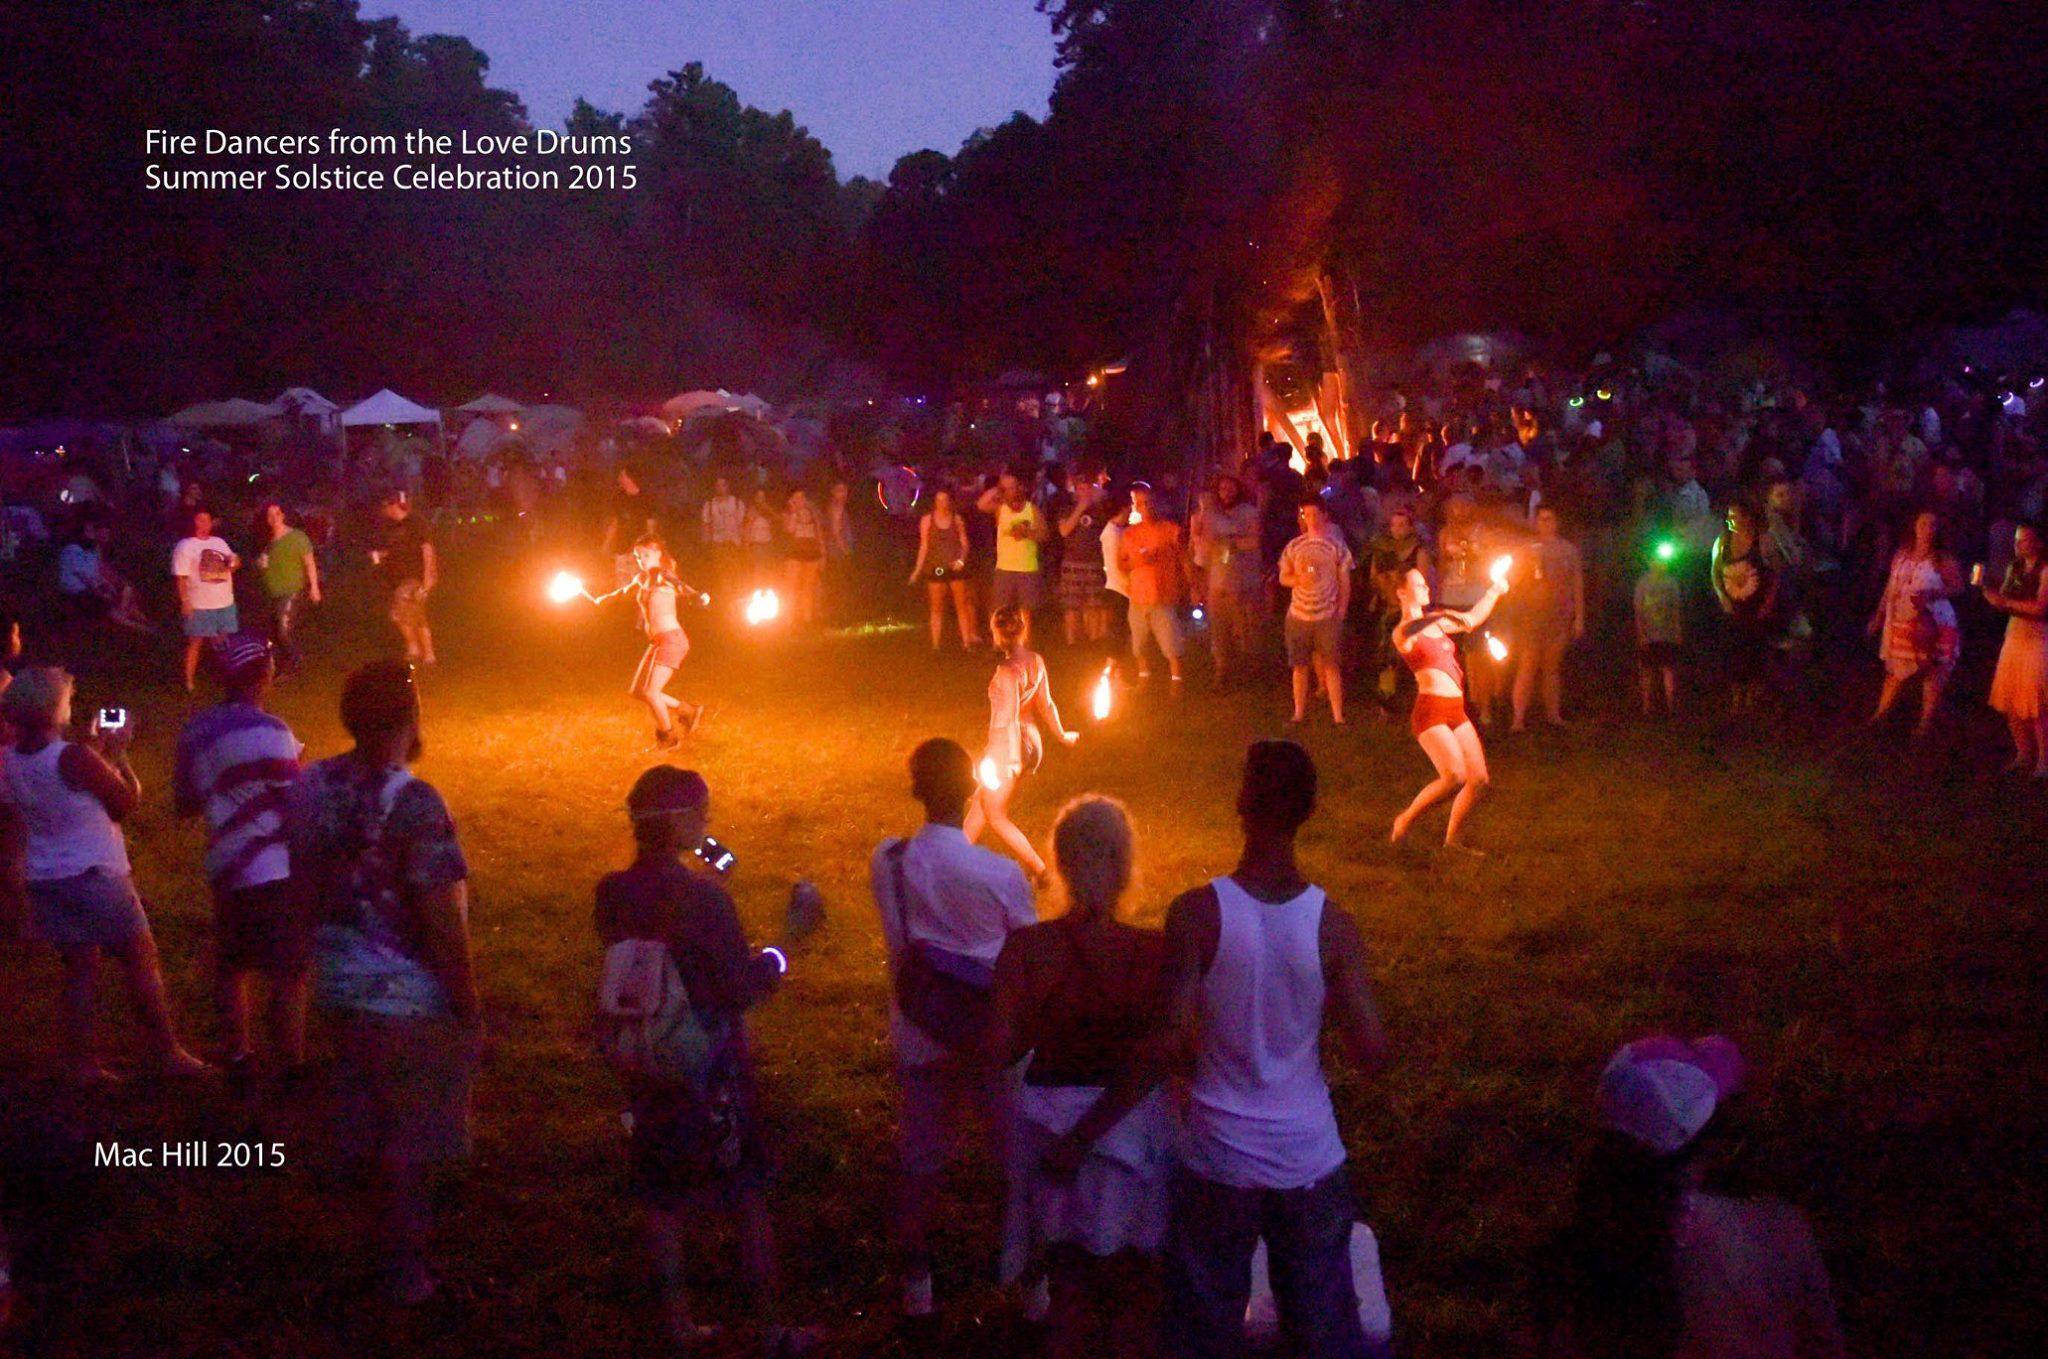 fire dancers crowd music festival tn